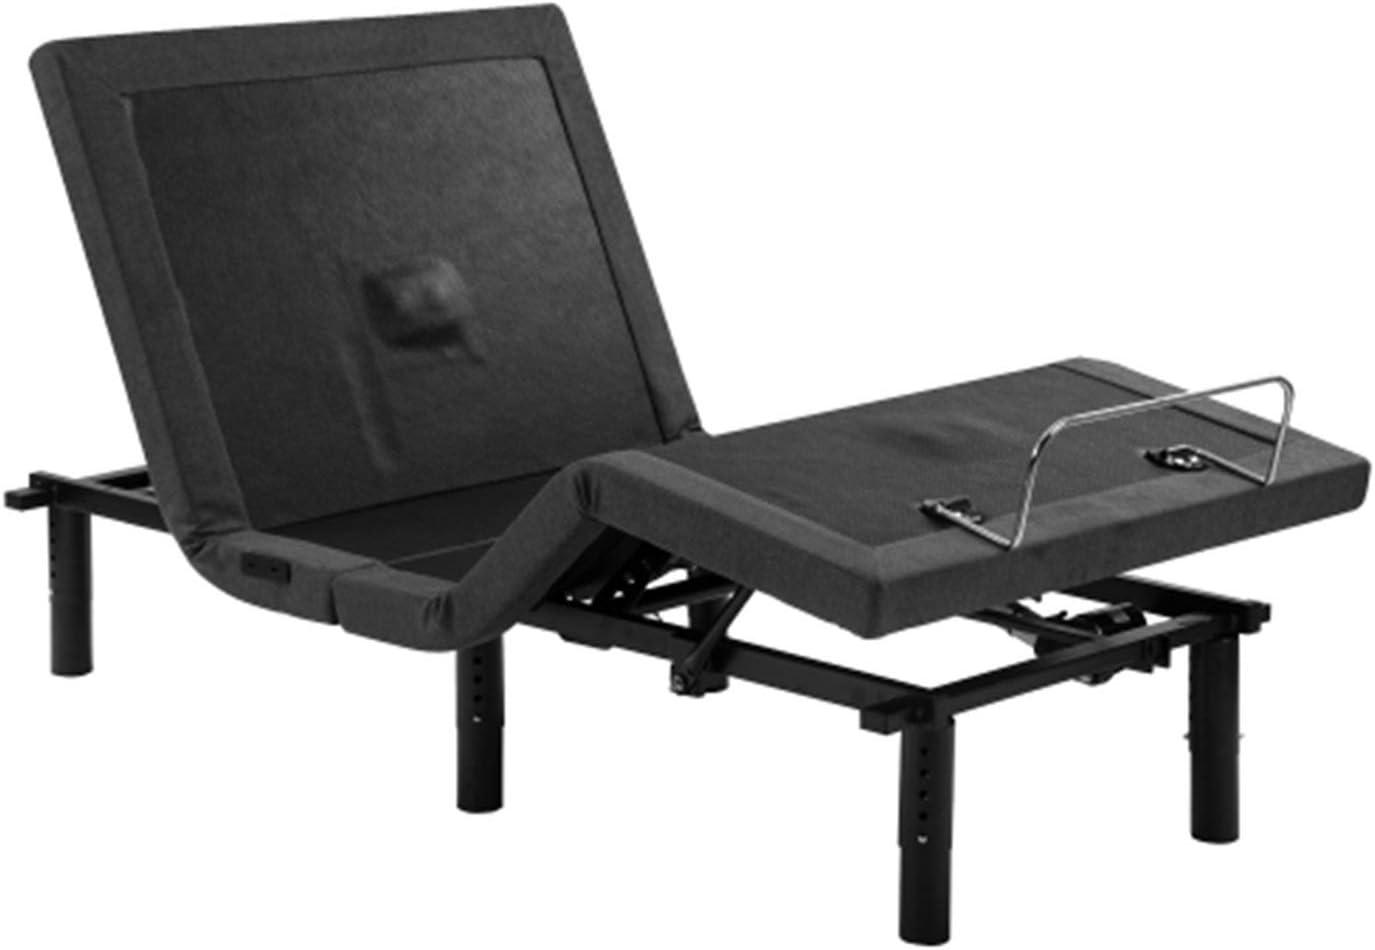 YANGLIYU Adjustable Bed Base with 2 USB Charge Ports, Adjustable